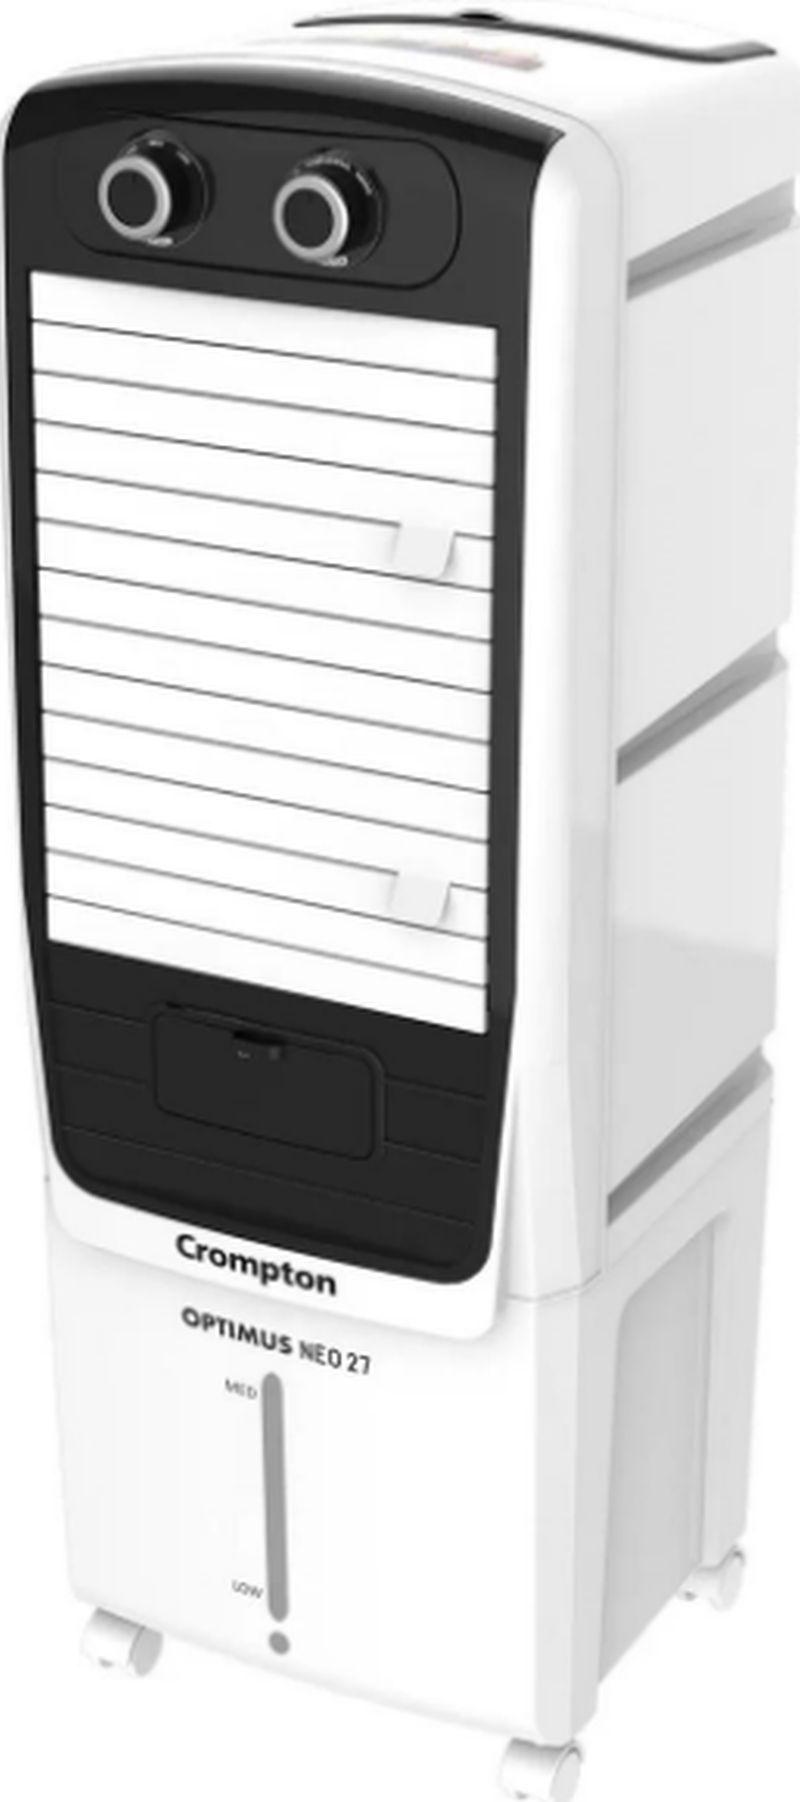 Crompton Optimus Neo 27 tower cooler